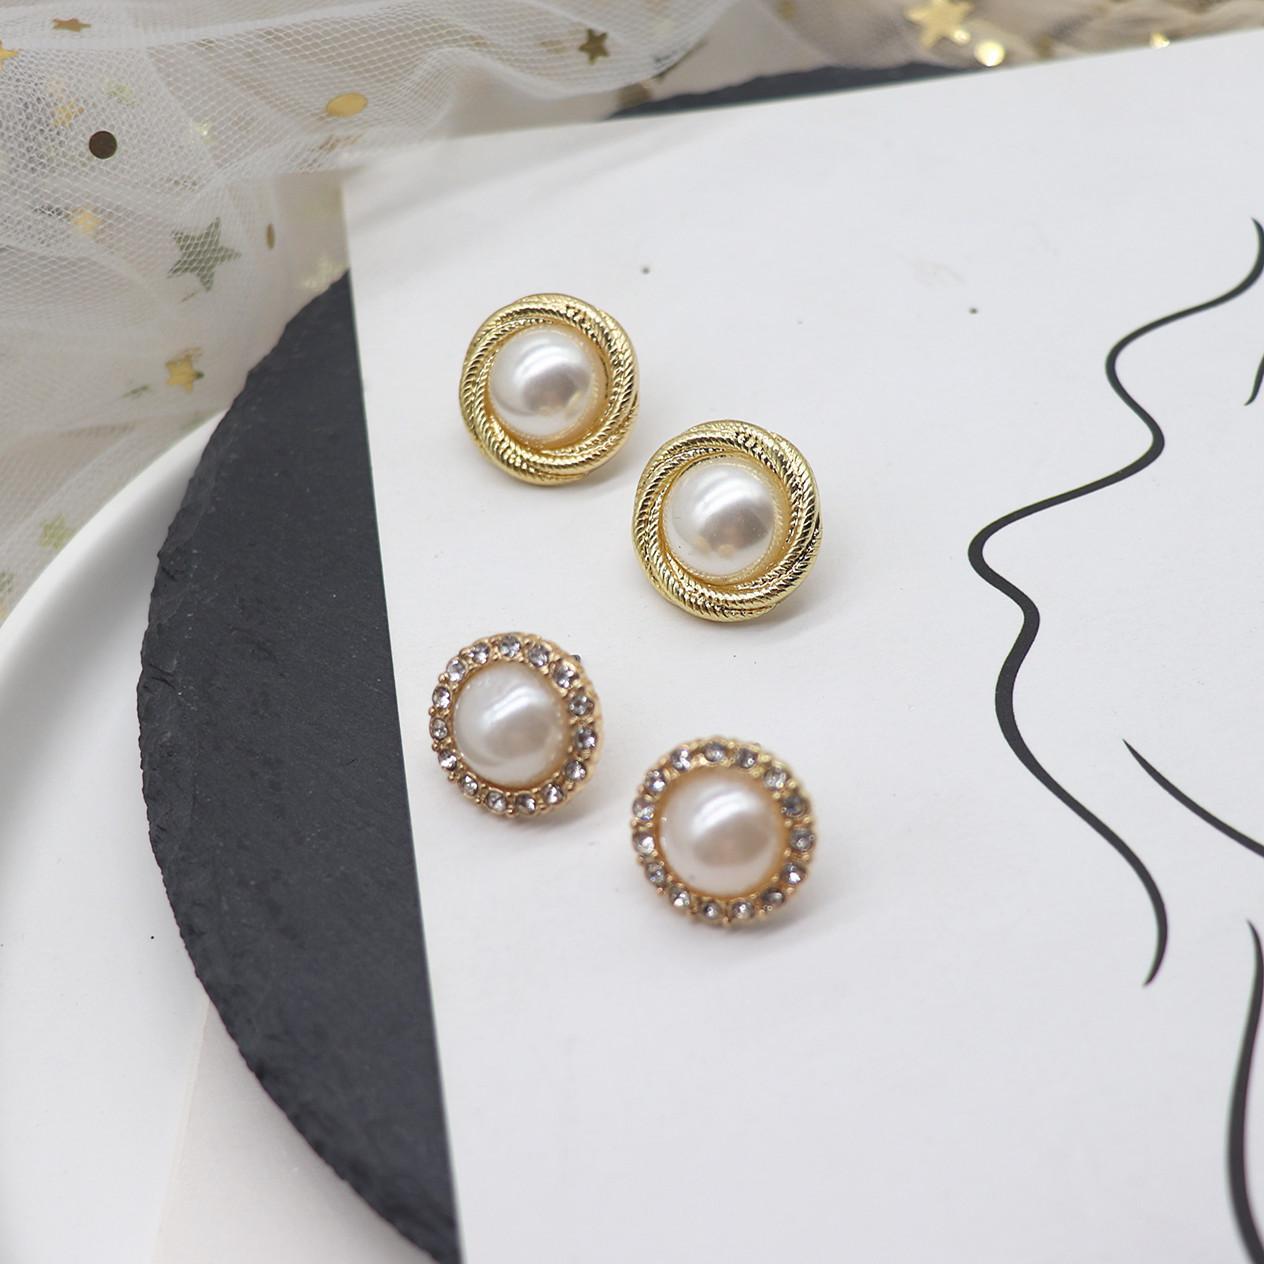 Japan and South Korea pearl girl ear jewelry, minority, commuting and versatile student Pearl Earrings temperament earrings earrings, female